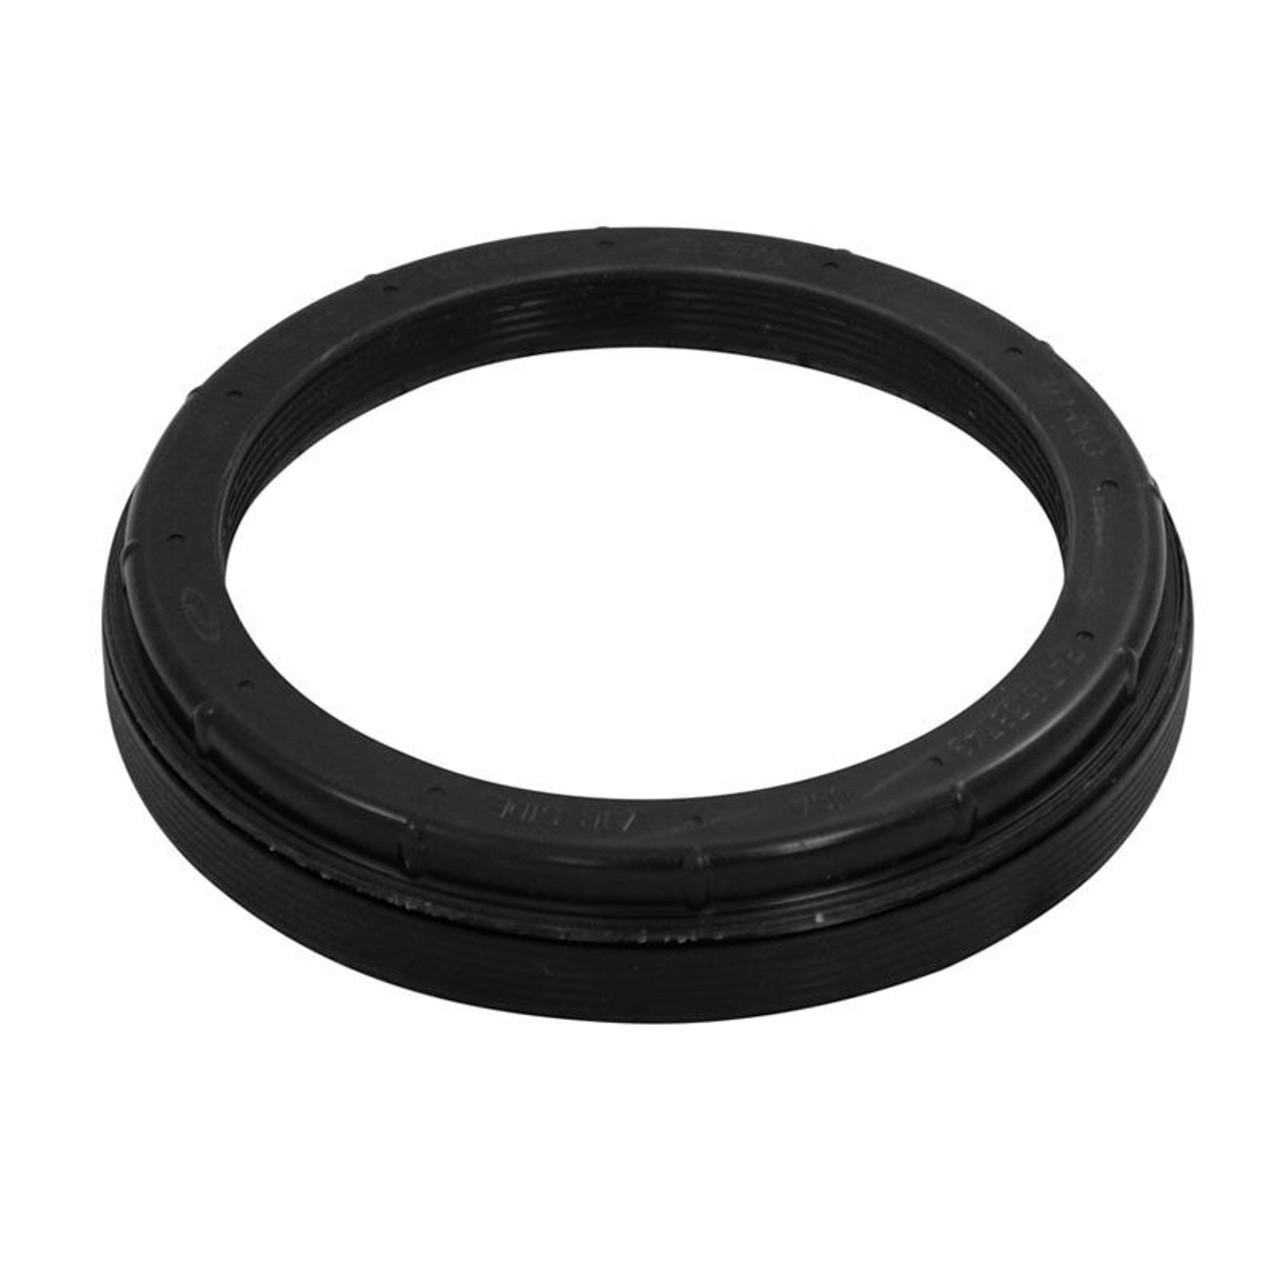 STEMCO / 373-0143 / Oil Seal (Voyager)